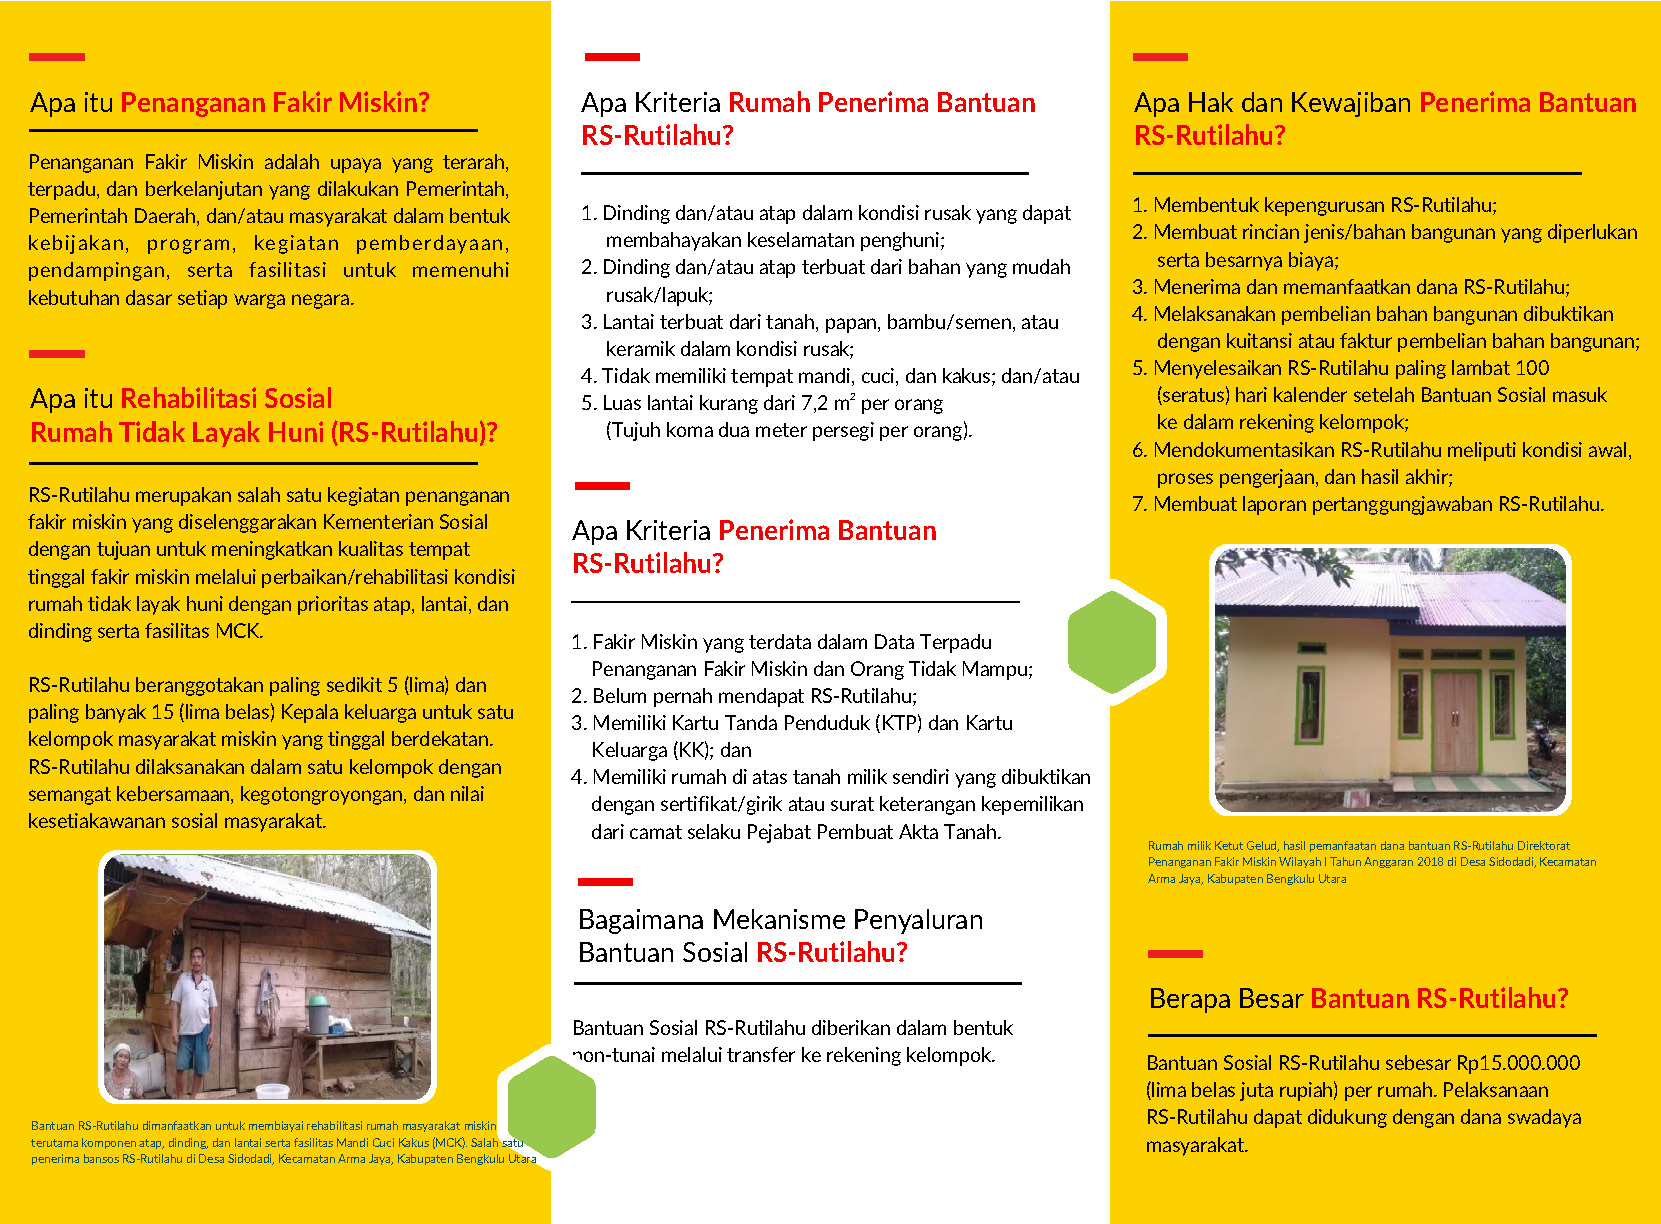 2019.03.08_Desain Leaflet PFM-Rutilahu REVISI X5 Kuning Revisi_Page_1